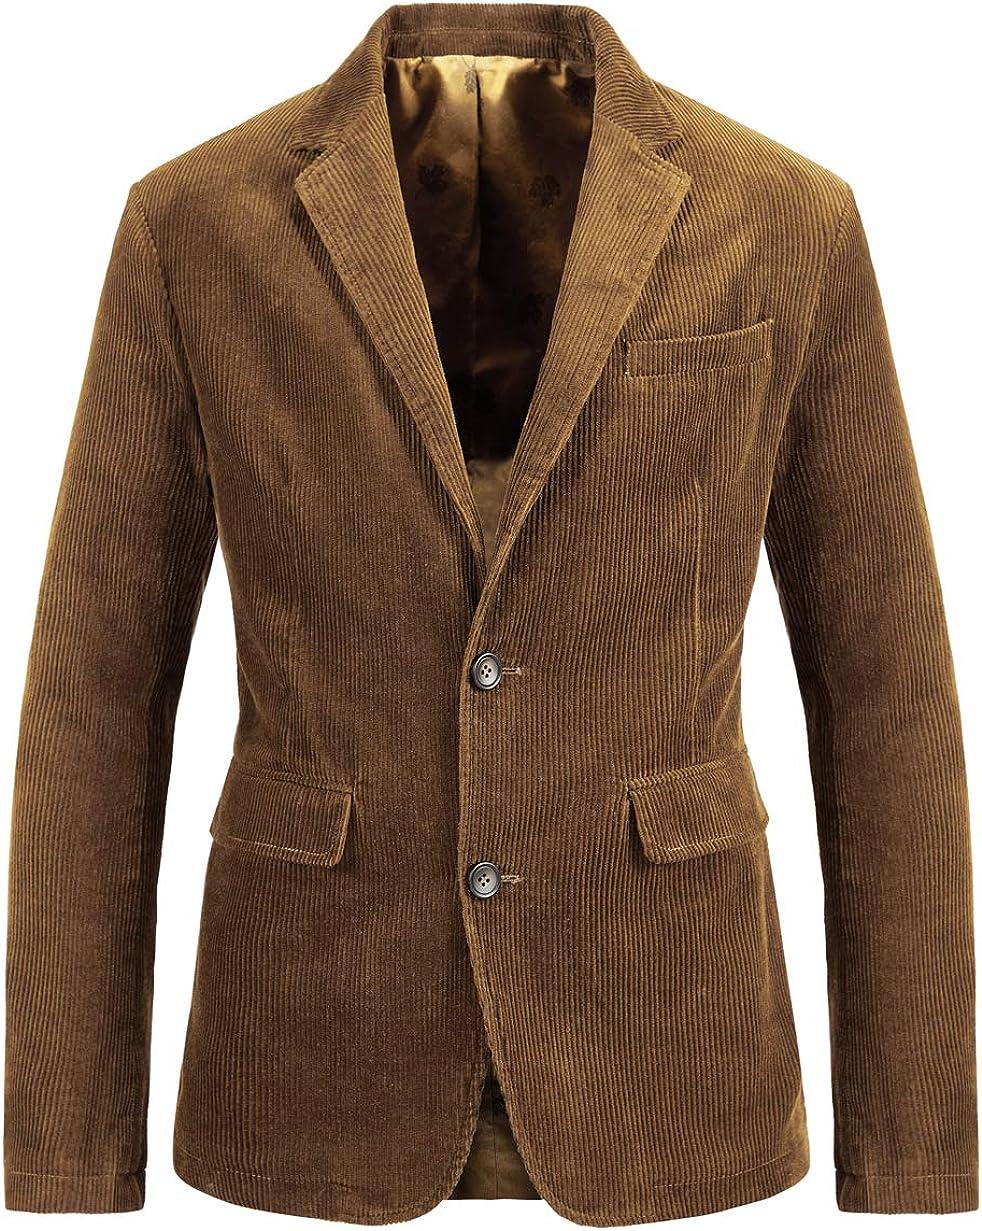 chouyatou Men's Vintage Casual Work Wear Corduroy Suit Blazer Jacket Sport Coat